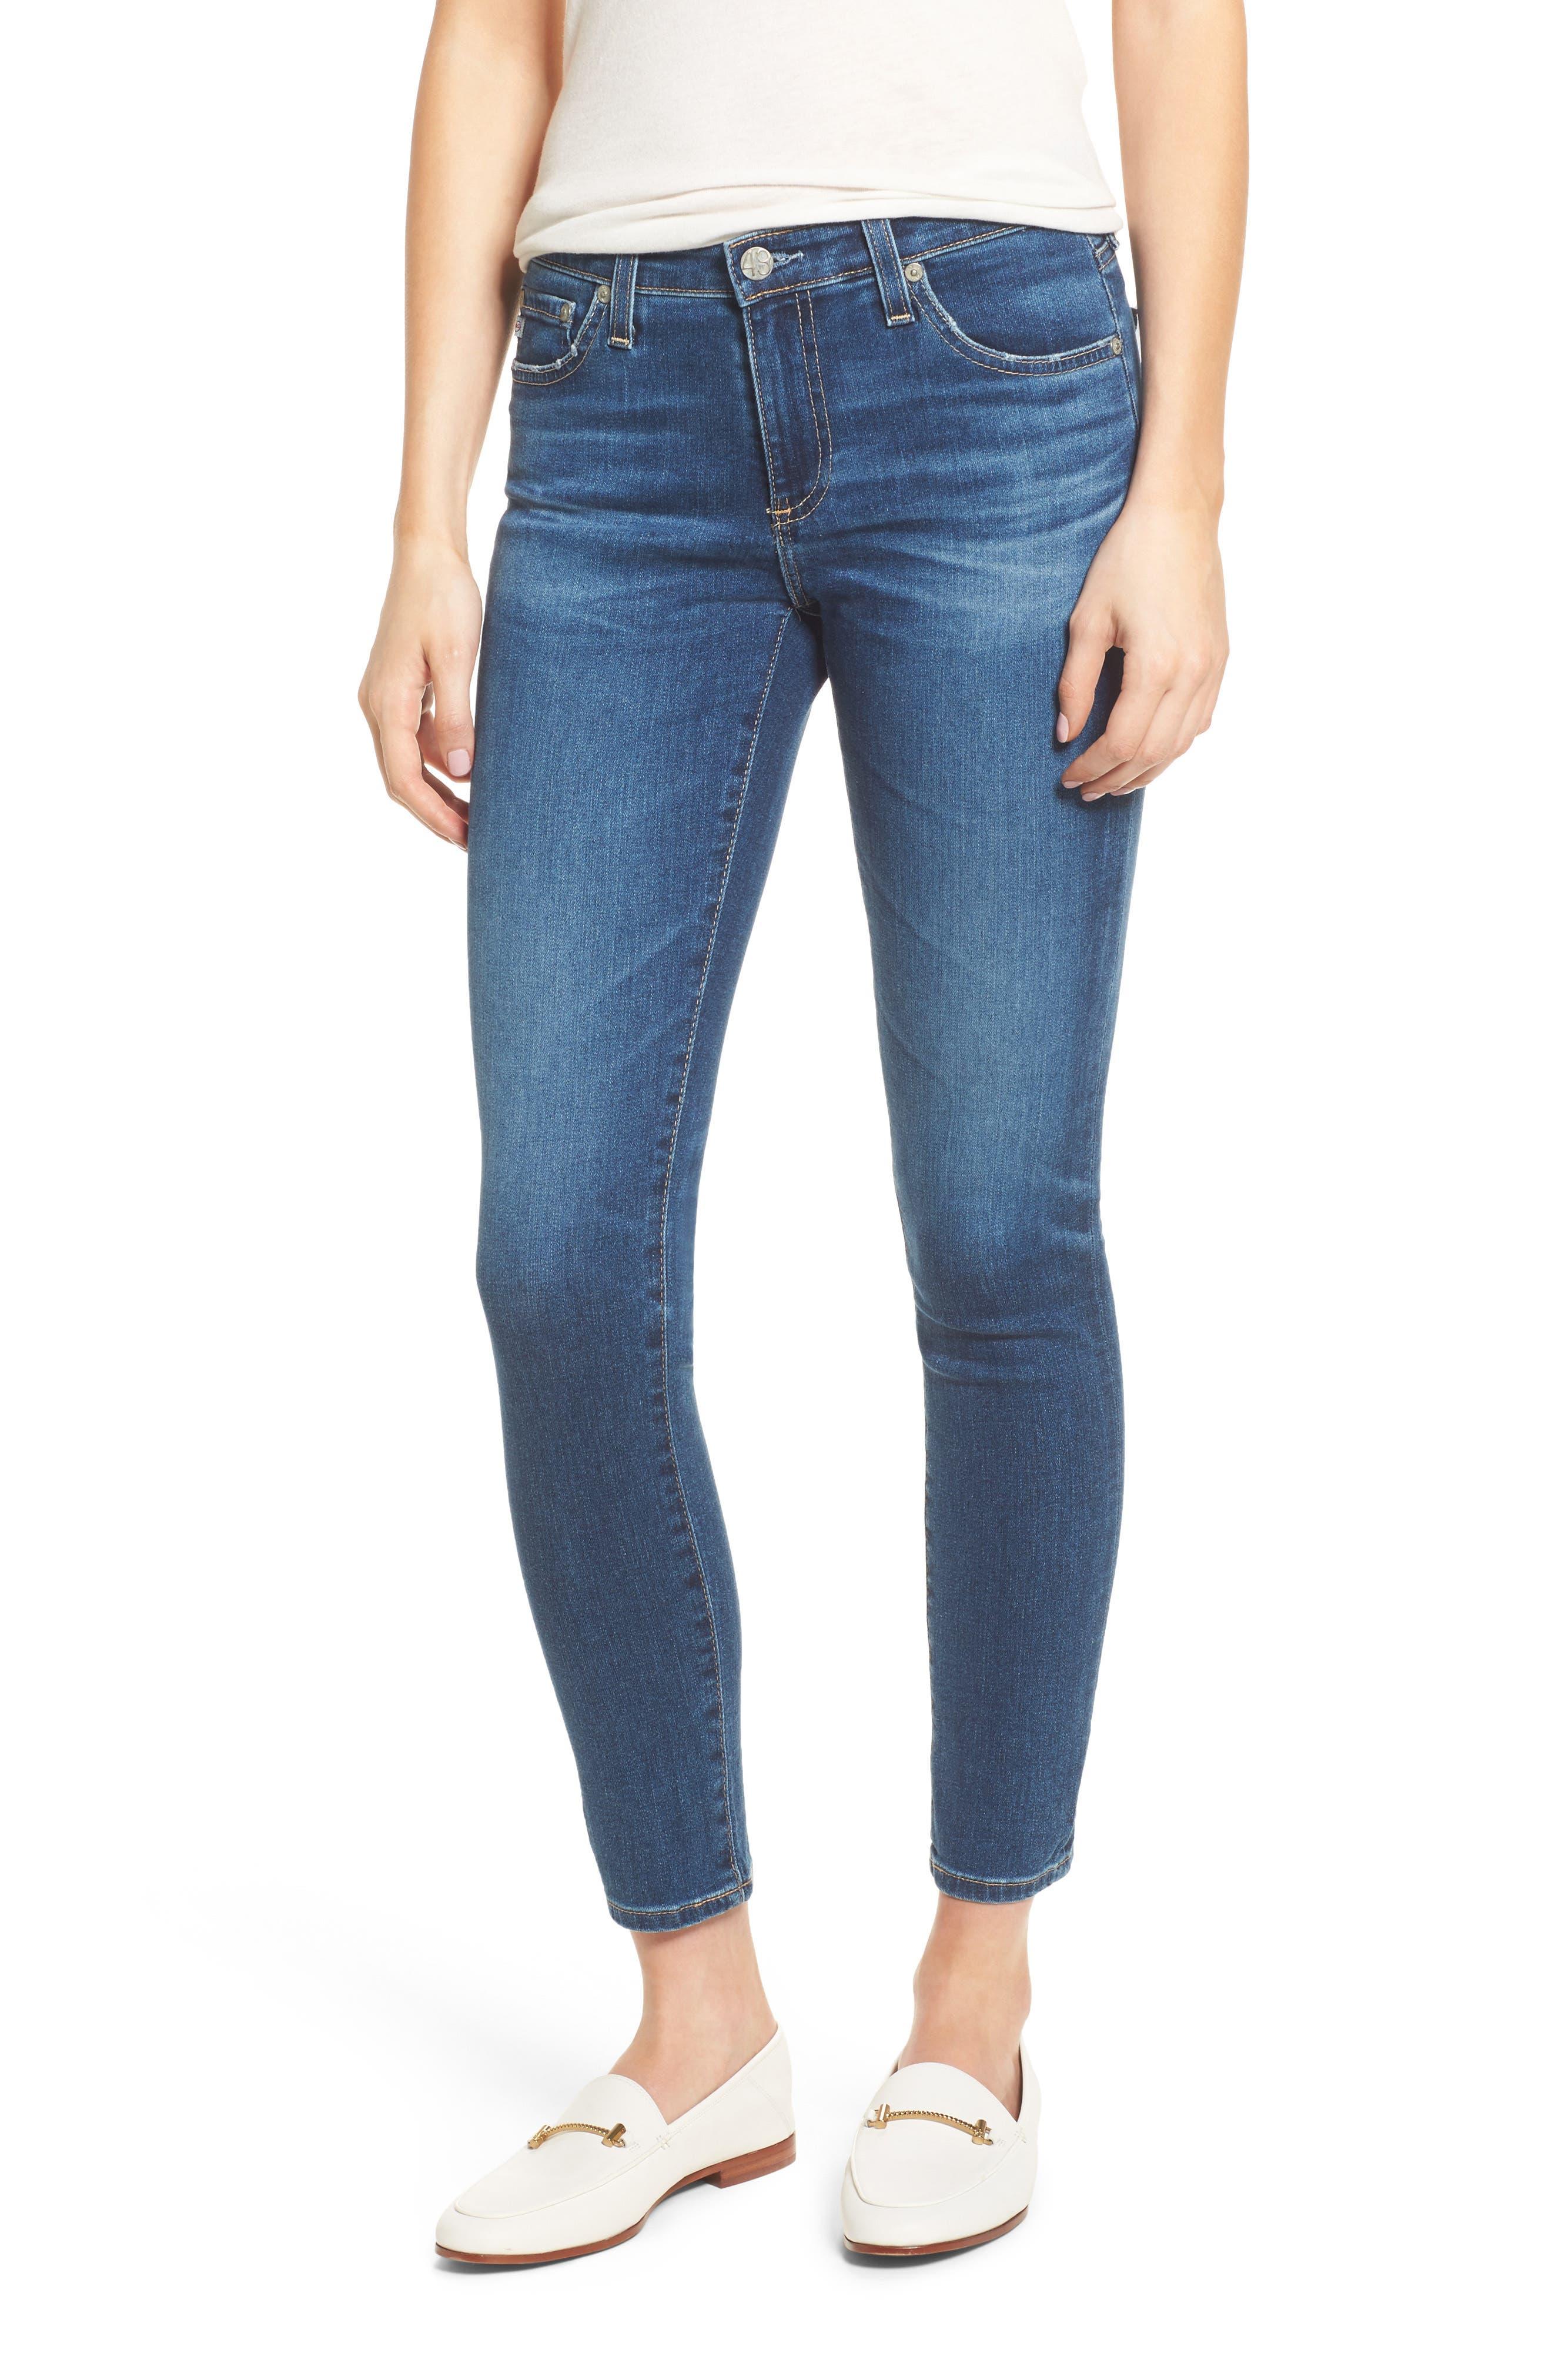 Alternate Image 1 Selected - AG The Legging Ankle Super Skinny Jeans